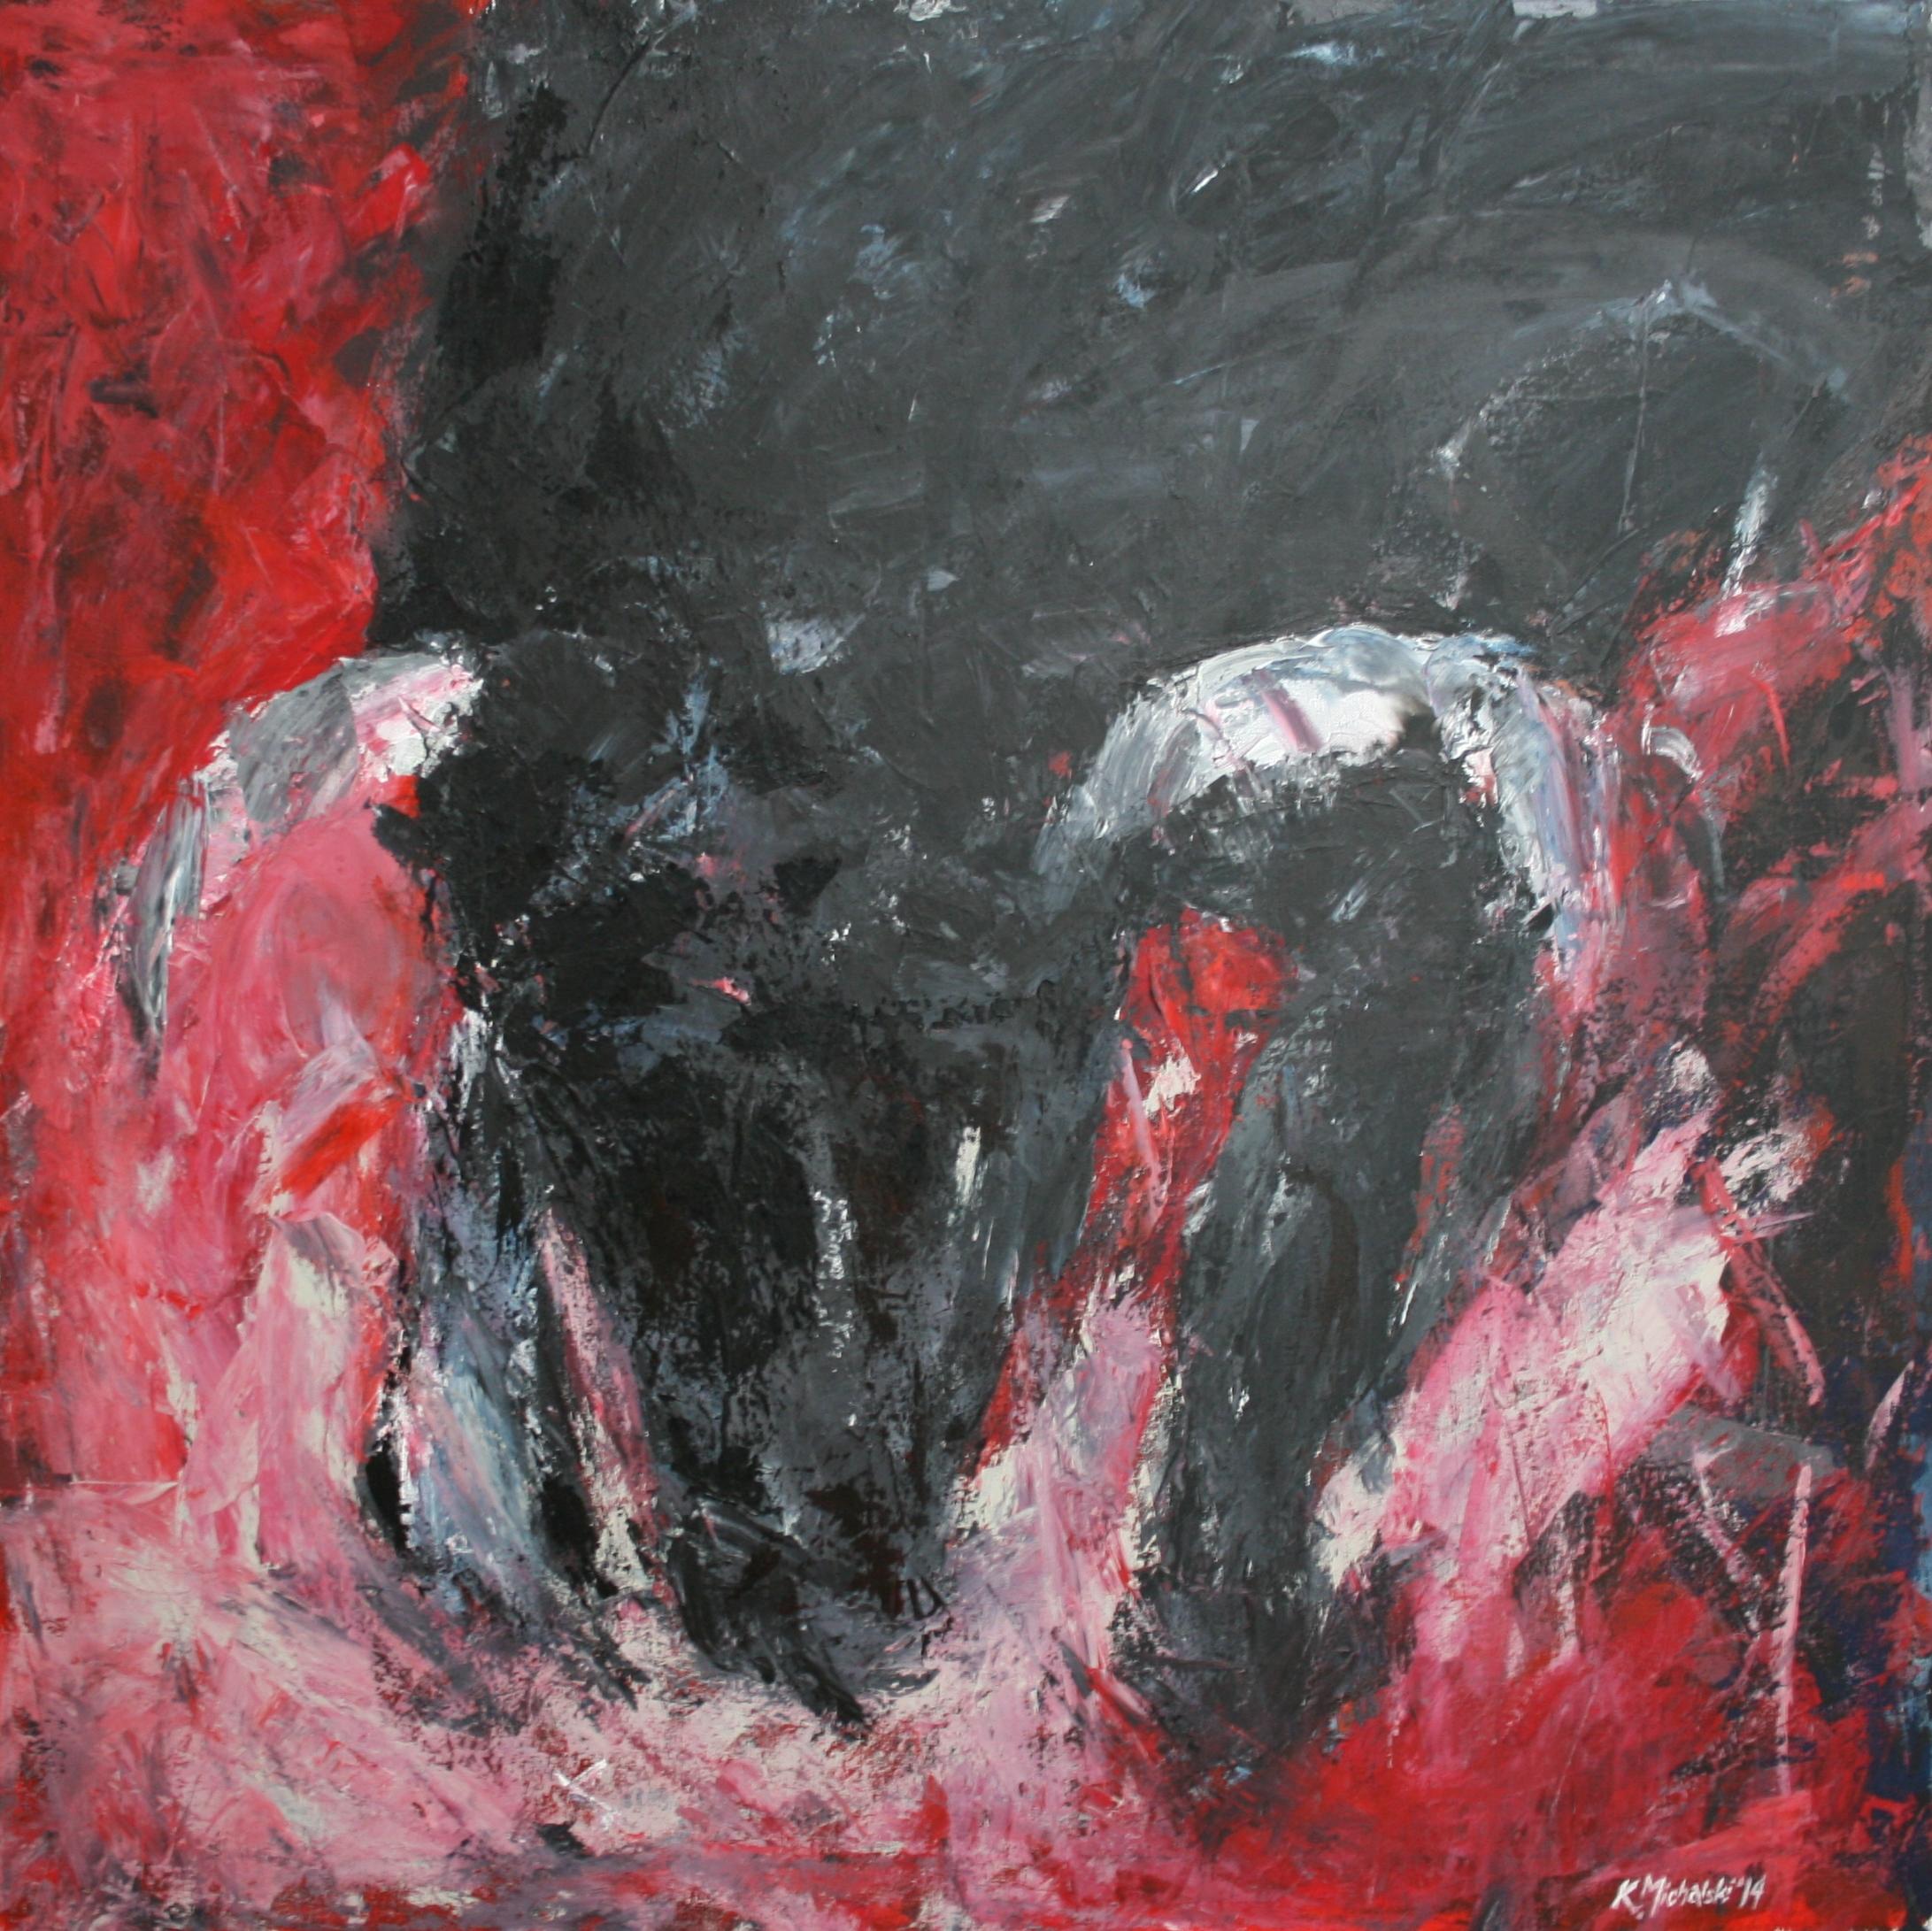 Der Stier, 2014, 100x100, Acryl auf Leinwand